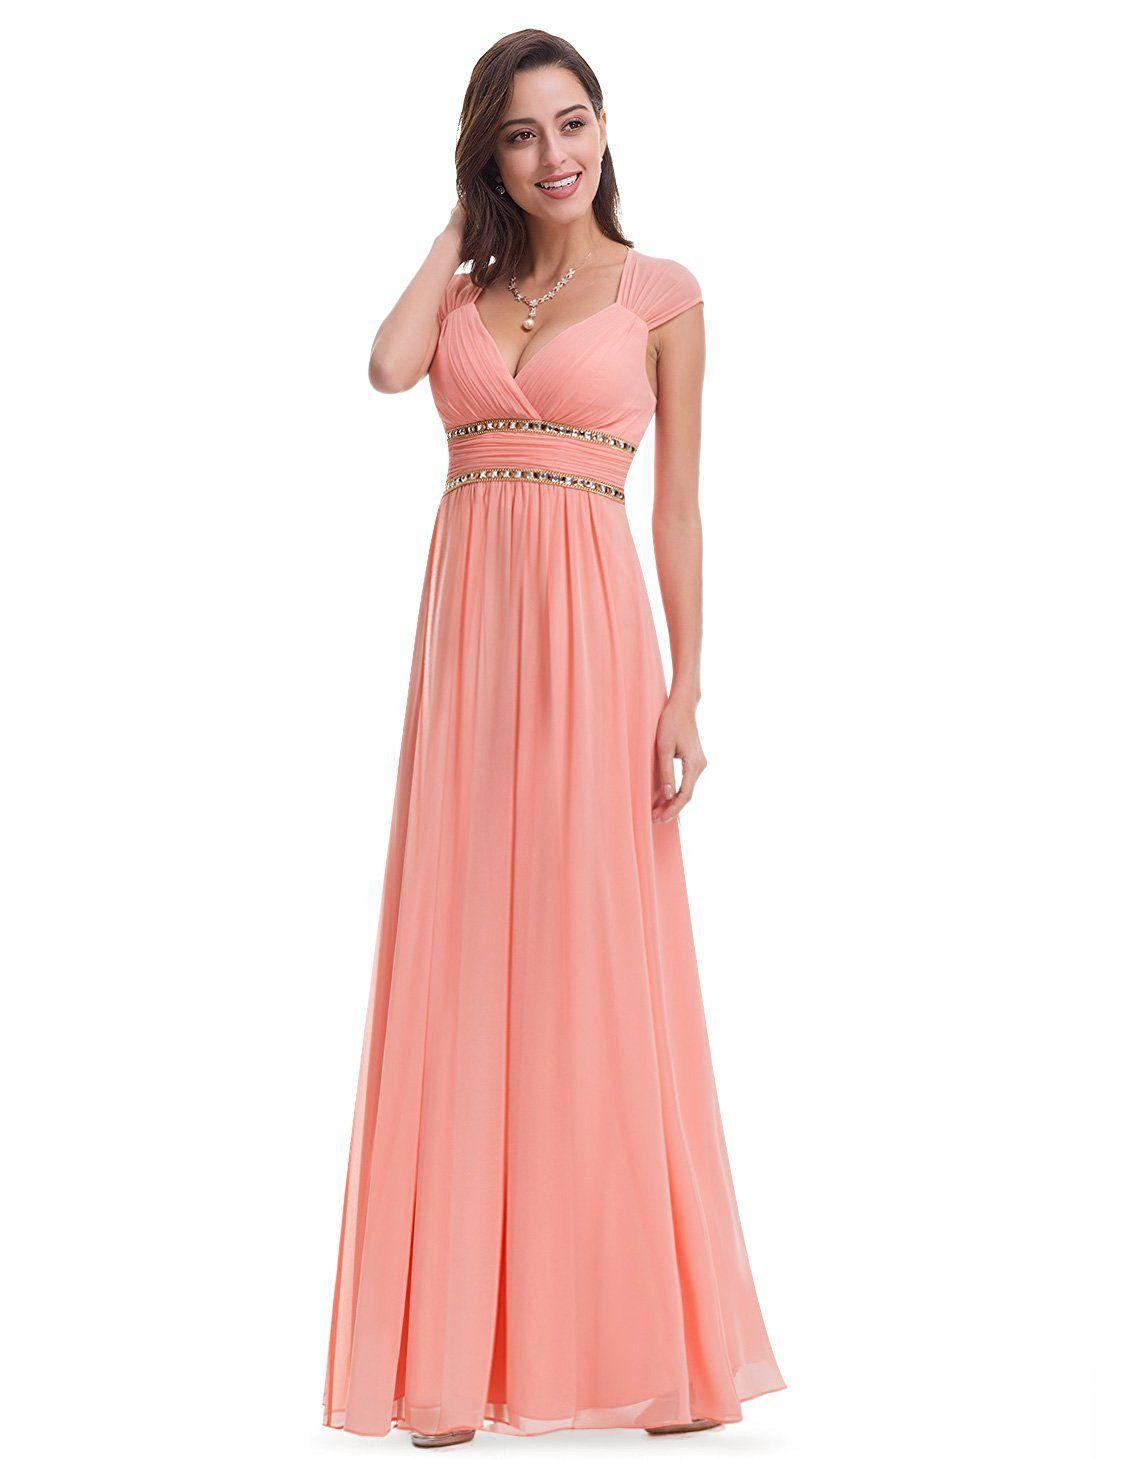 2272f814c6cd Ever-Pretty Womens Floor Lenth Short Sleeve Graduation Dress 08697 ...